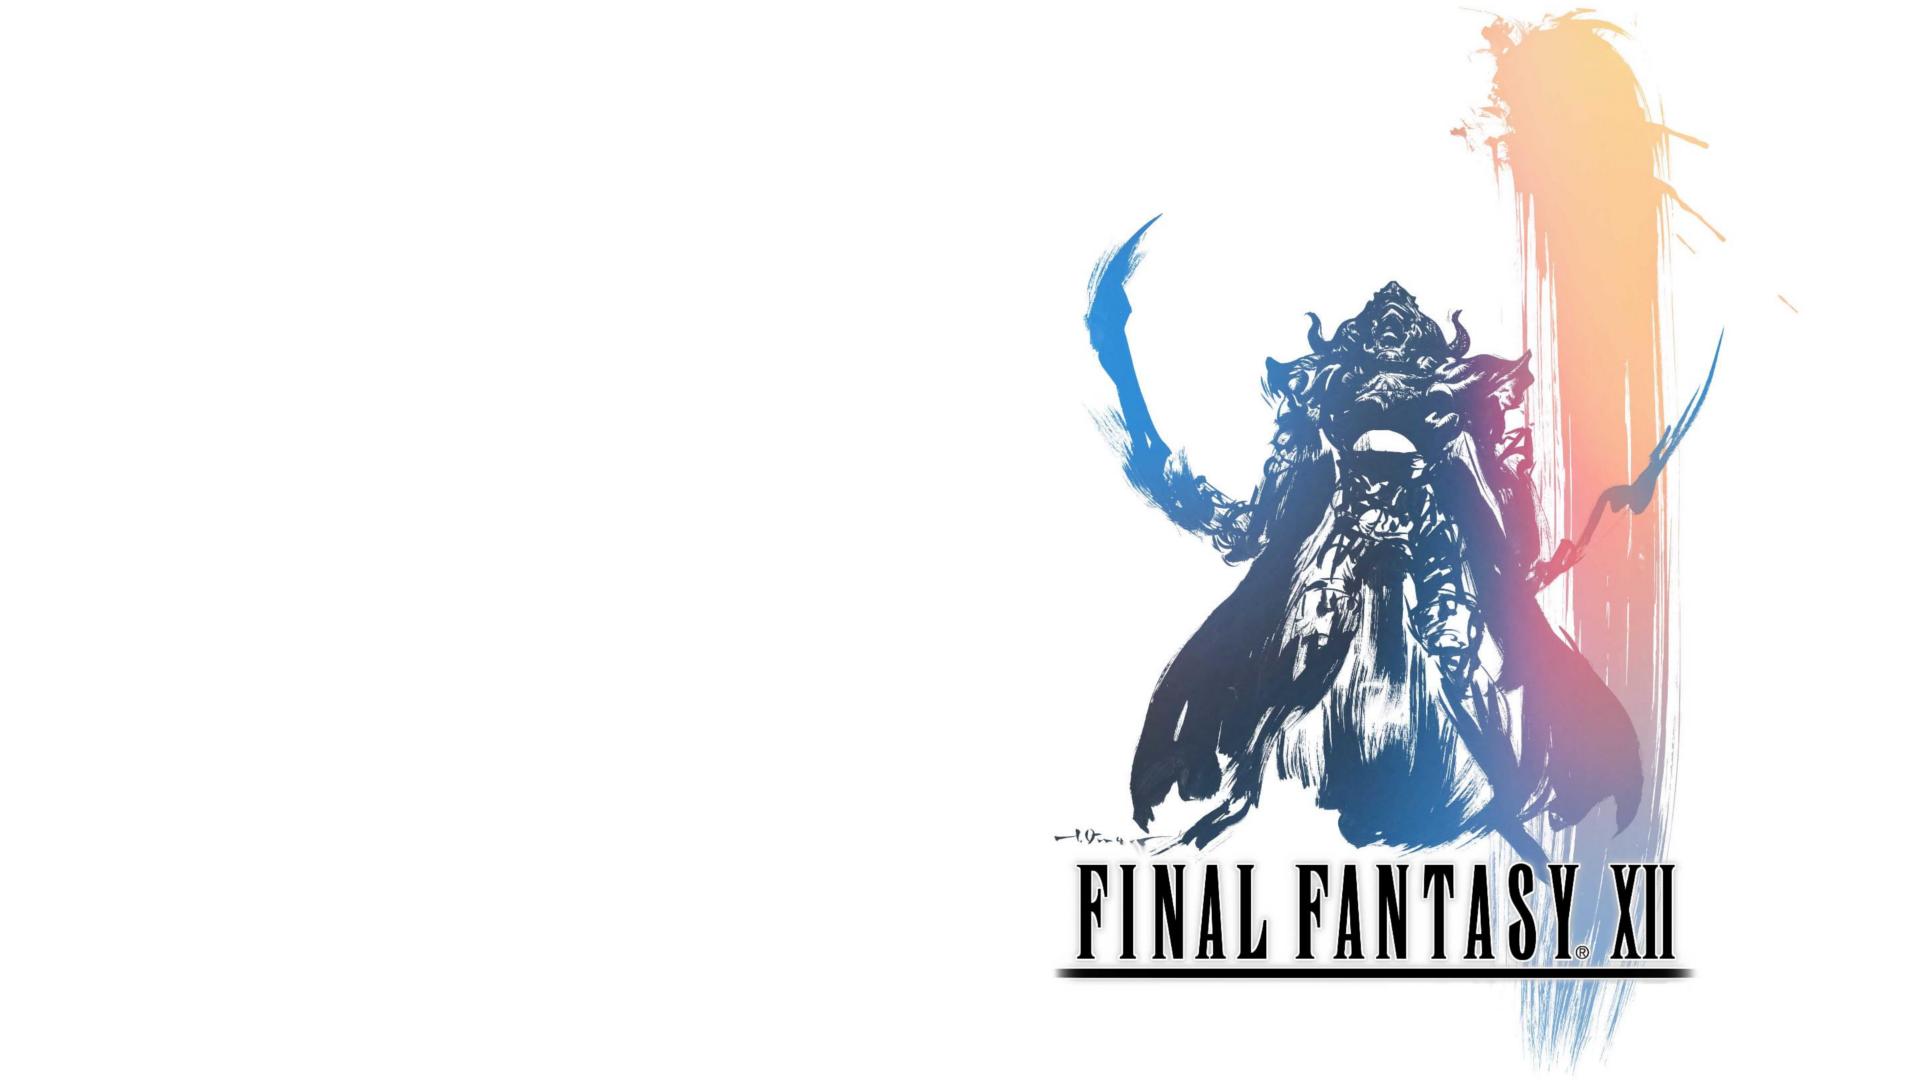 Gdr Final Fantasy XII